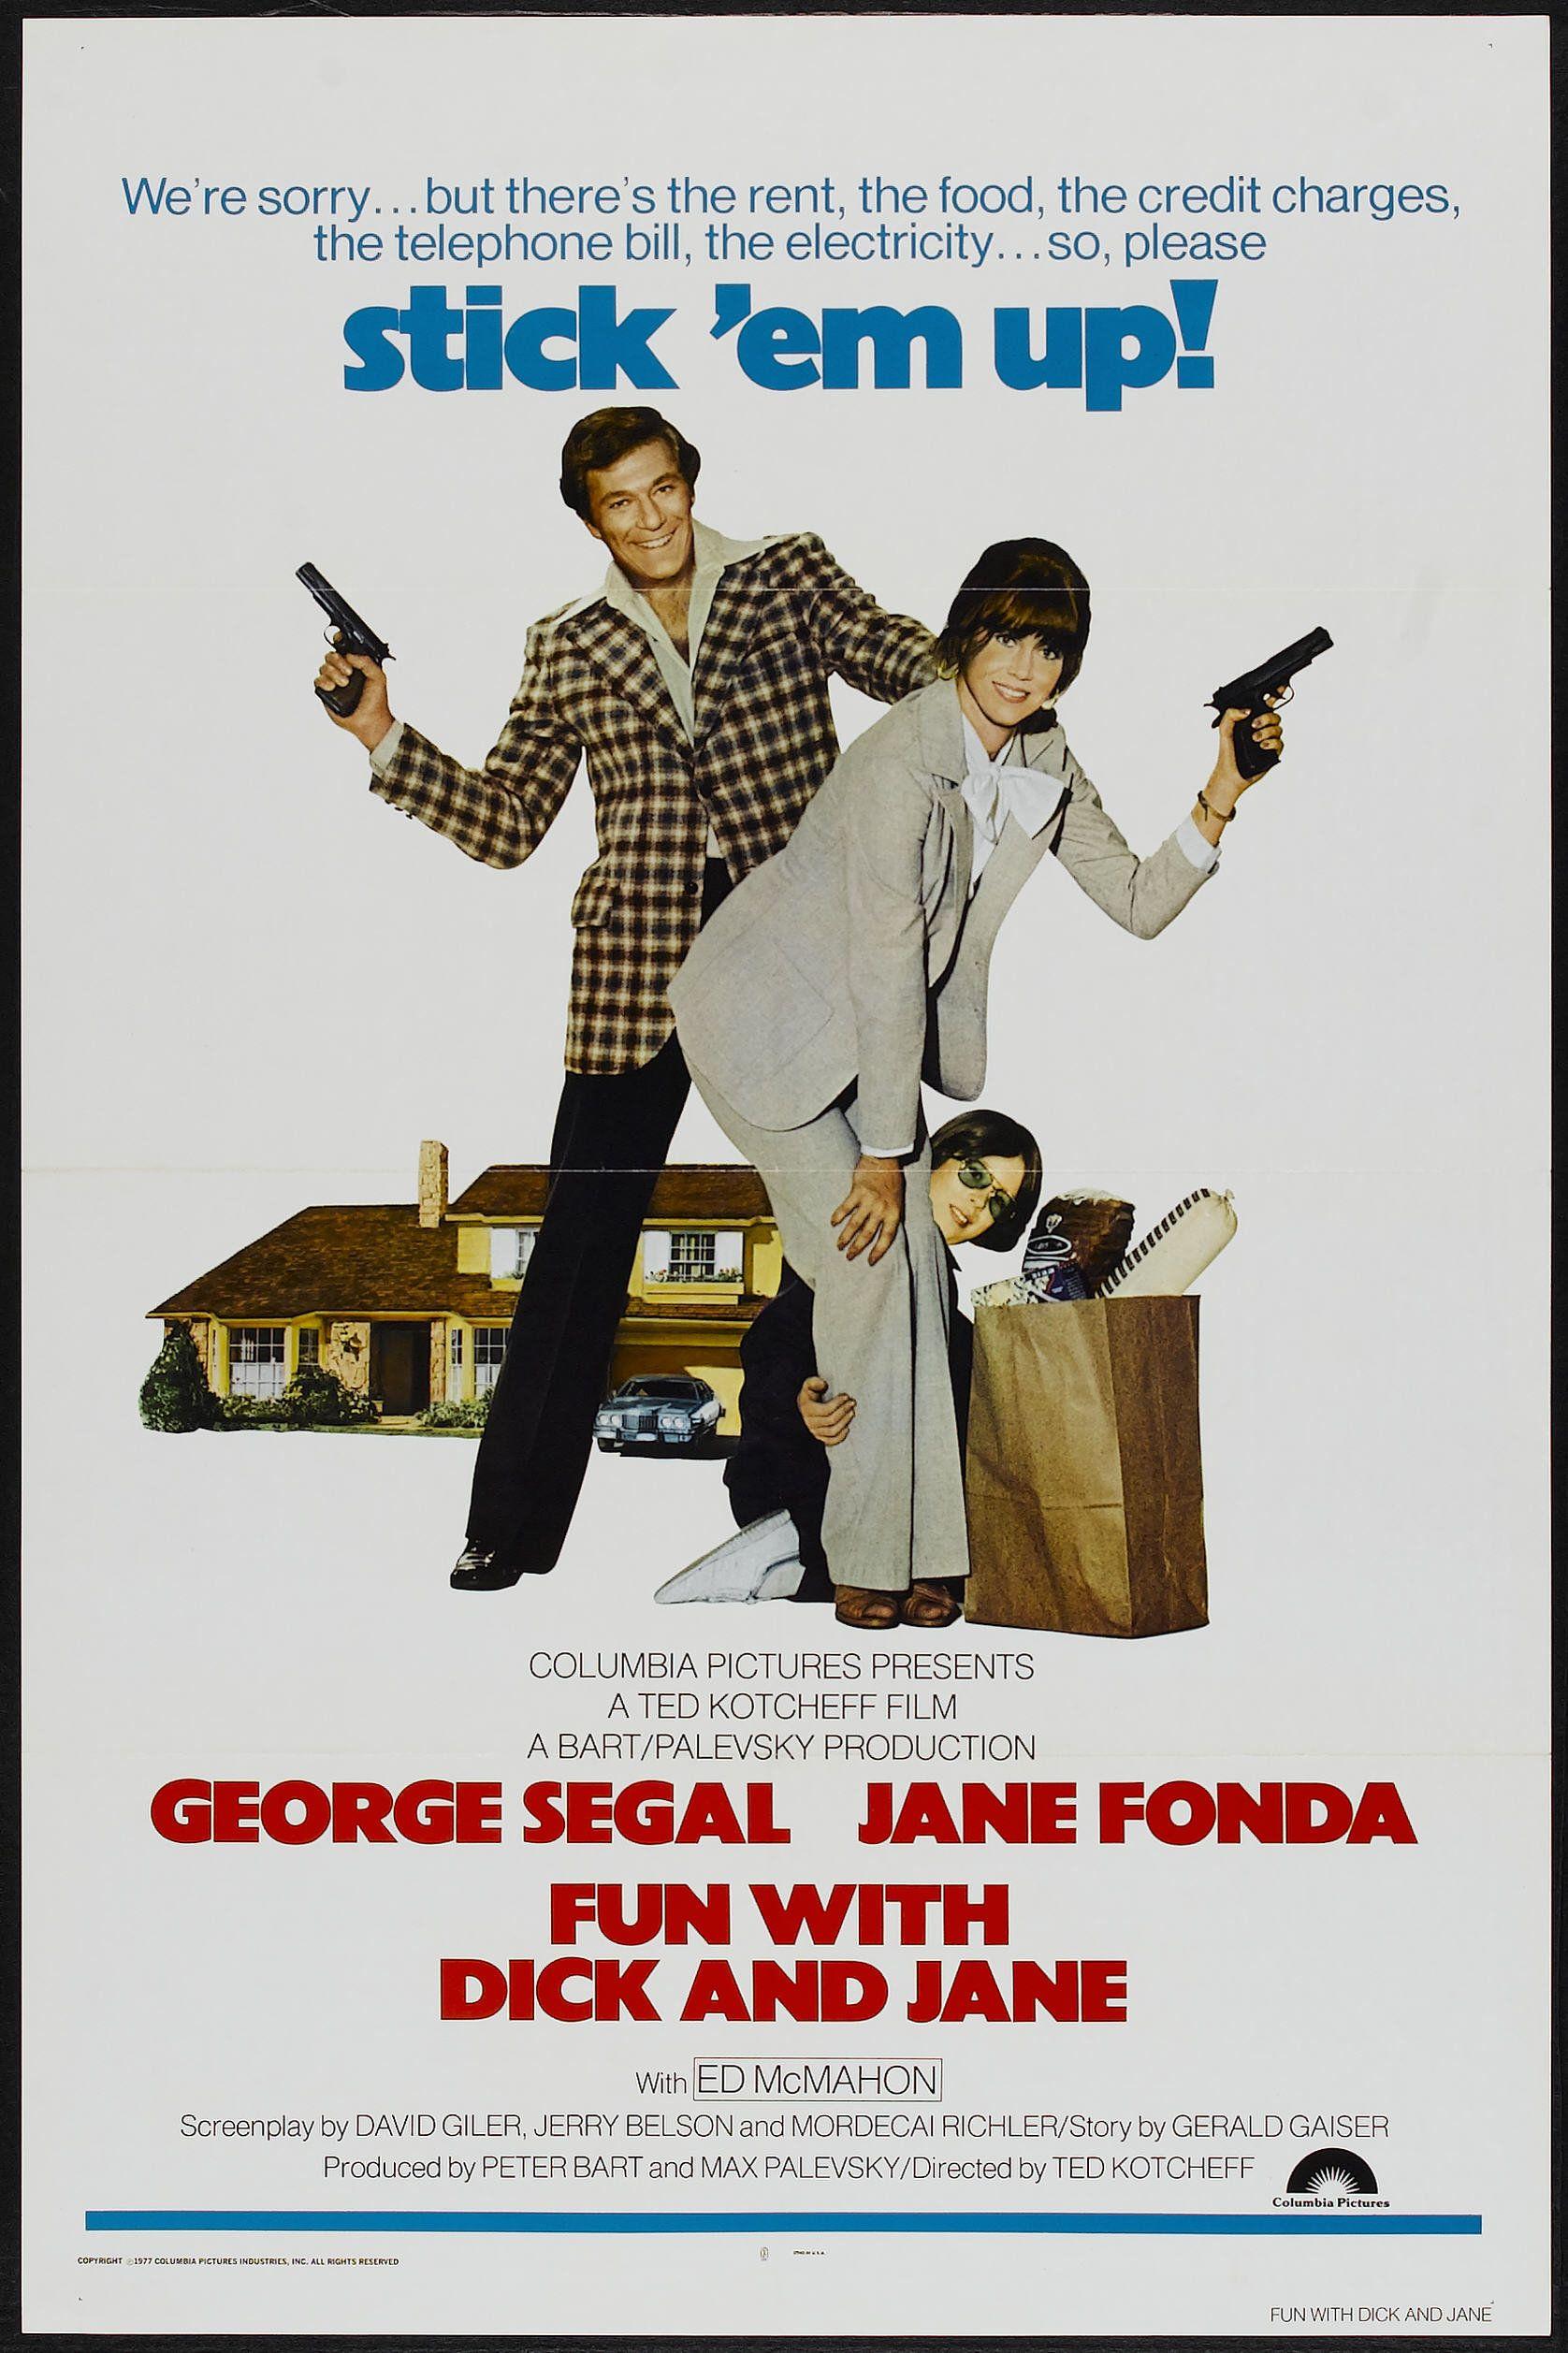 Fun With Dick And Jane 1977 Stars Jane Fonda George Segal Ed Mcmahon Richard Gautier John Dehner Sean Frye Director Ted Kotcheff